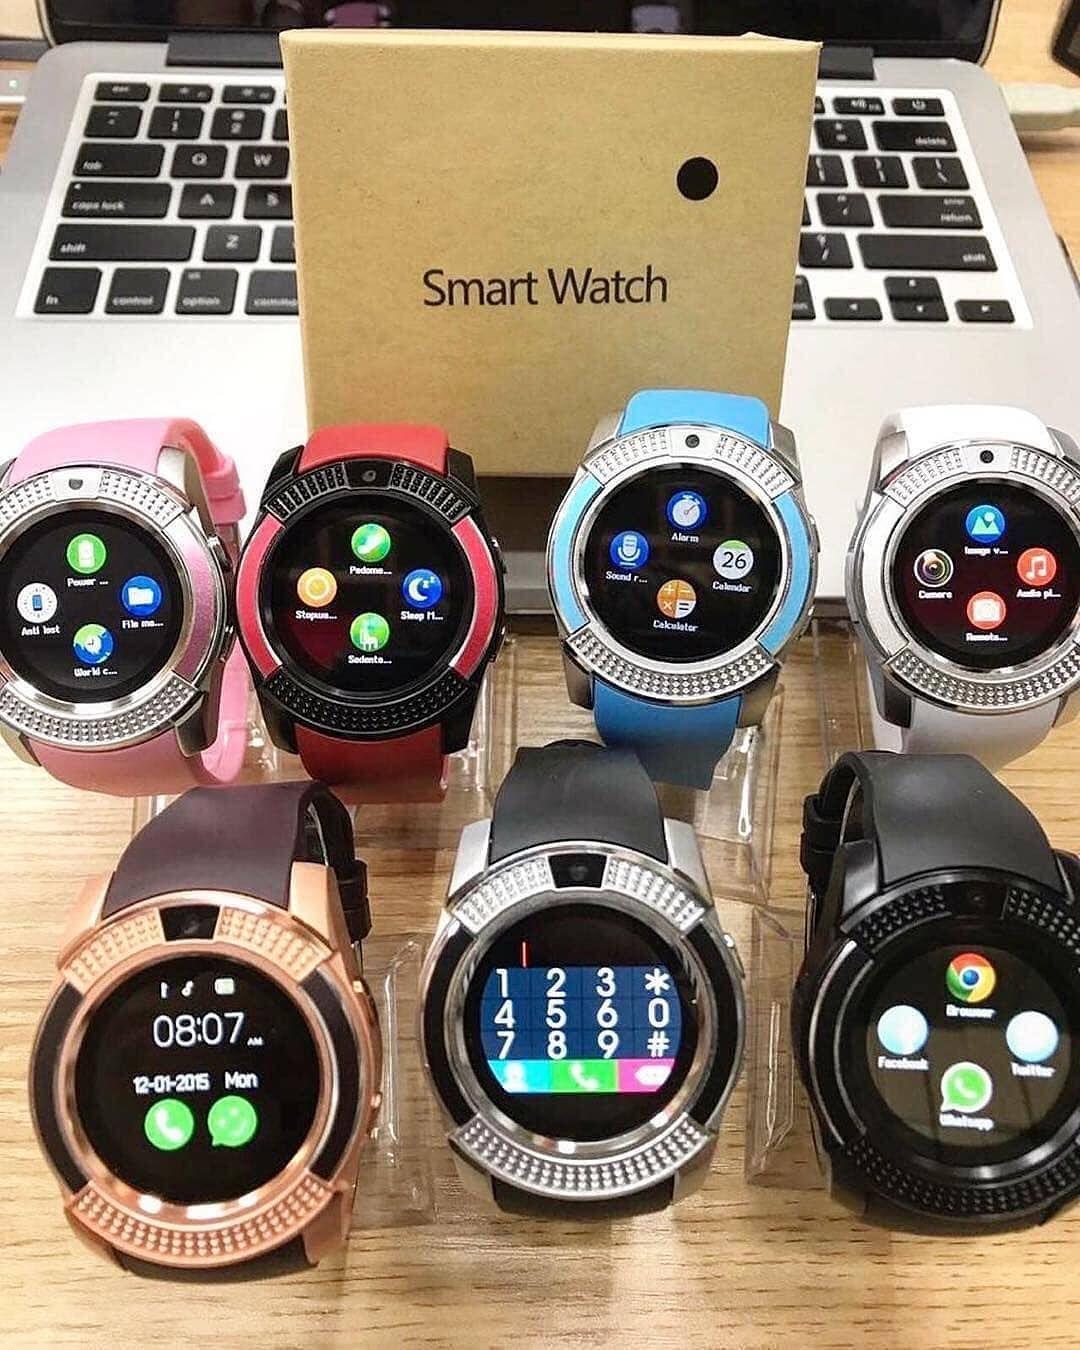 Harga : Rp 185 000 Harga : Rp 185 000   Smart Watch V8 / MIRIP